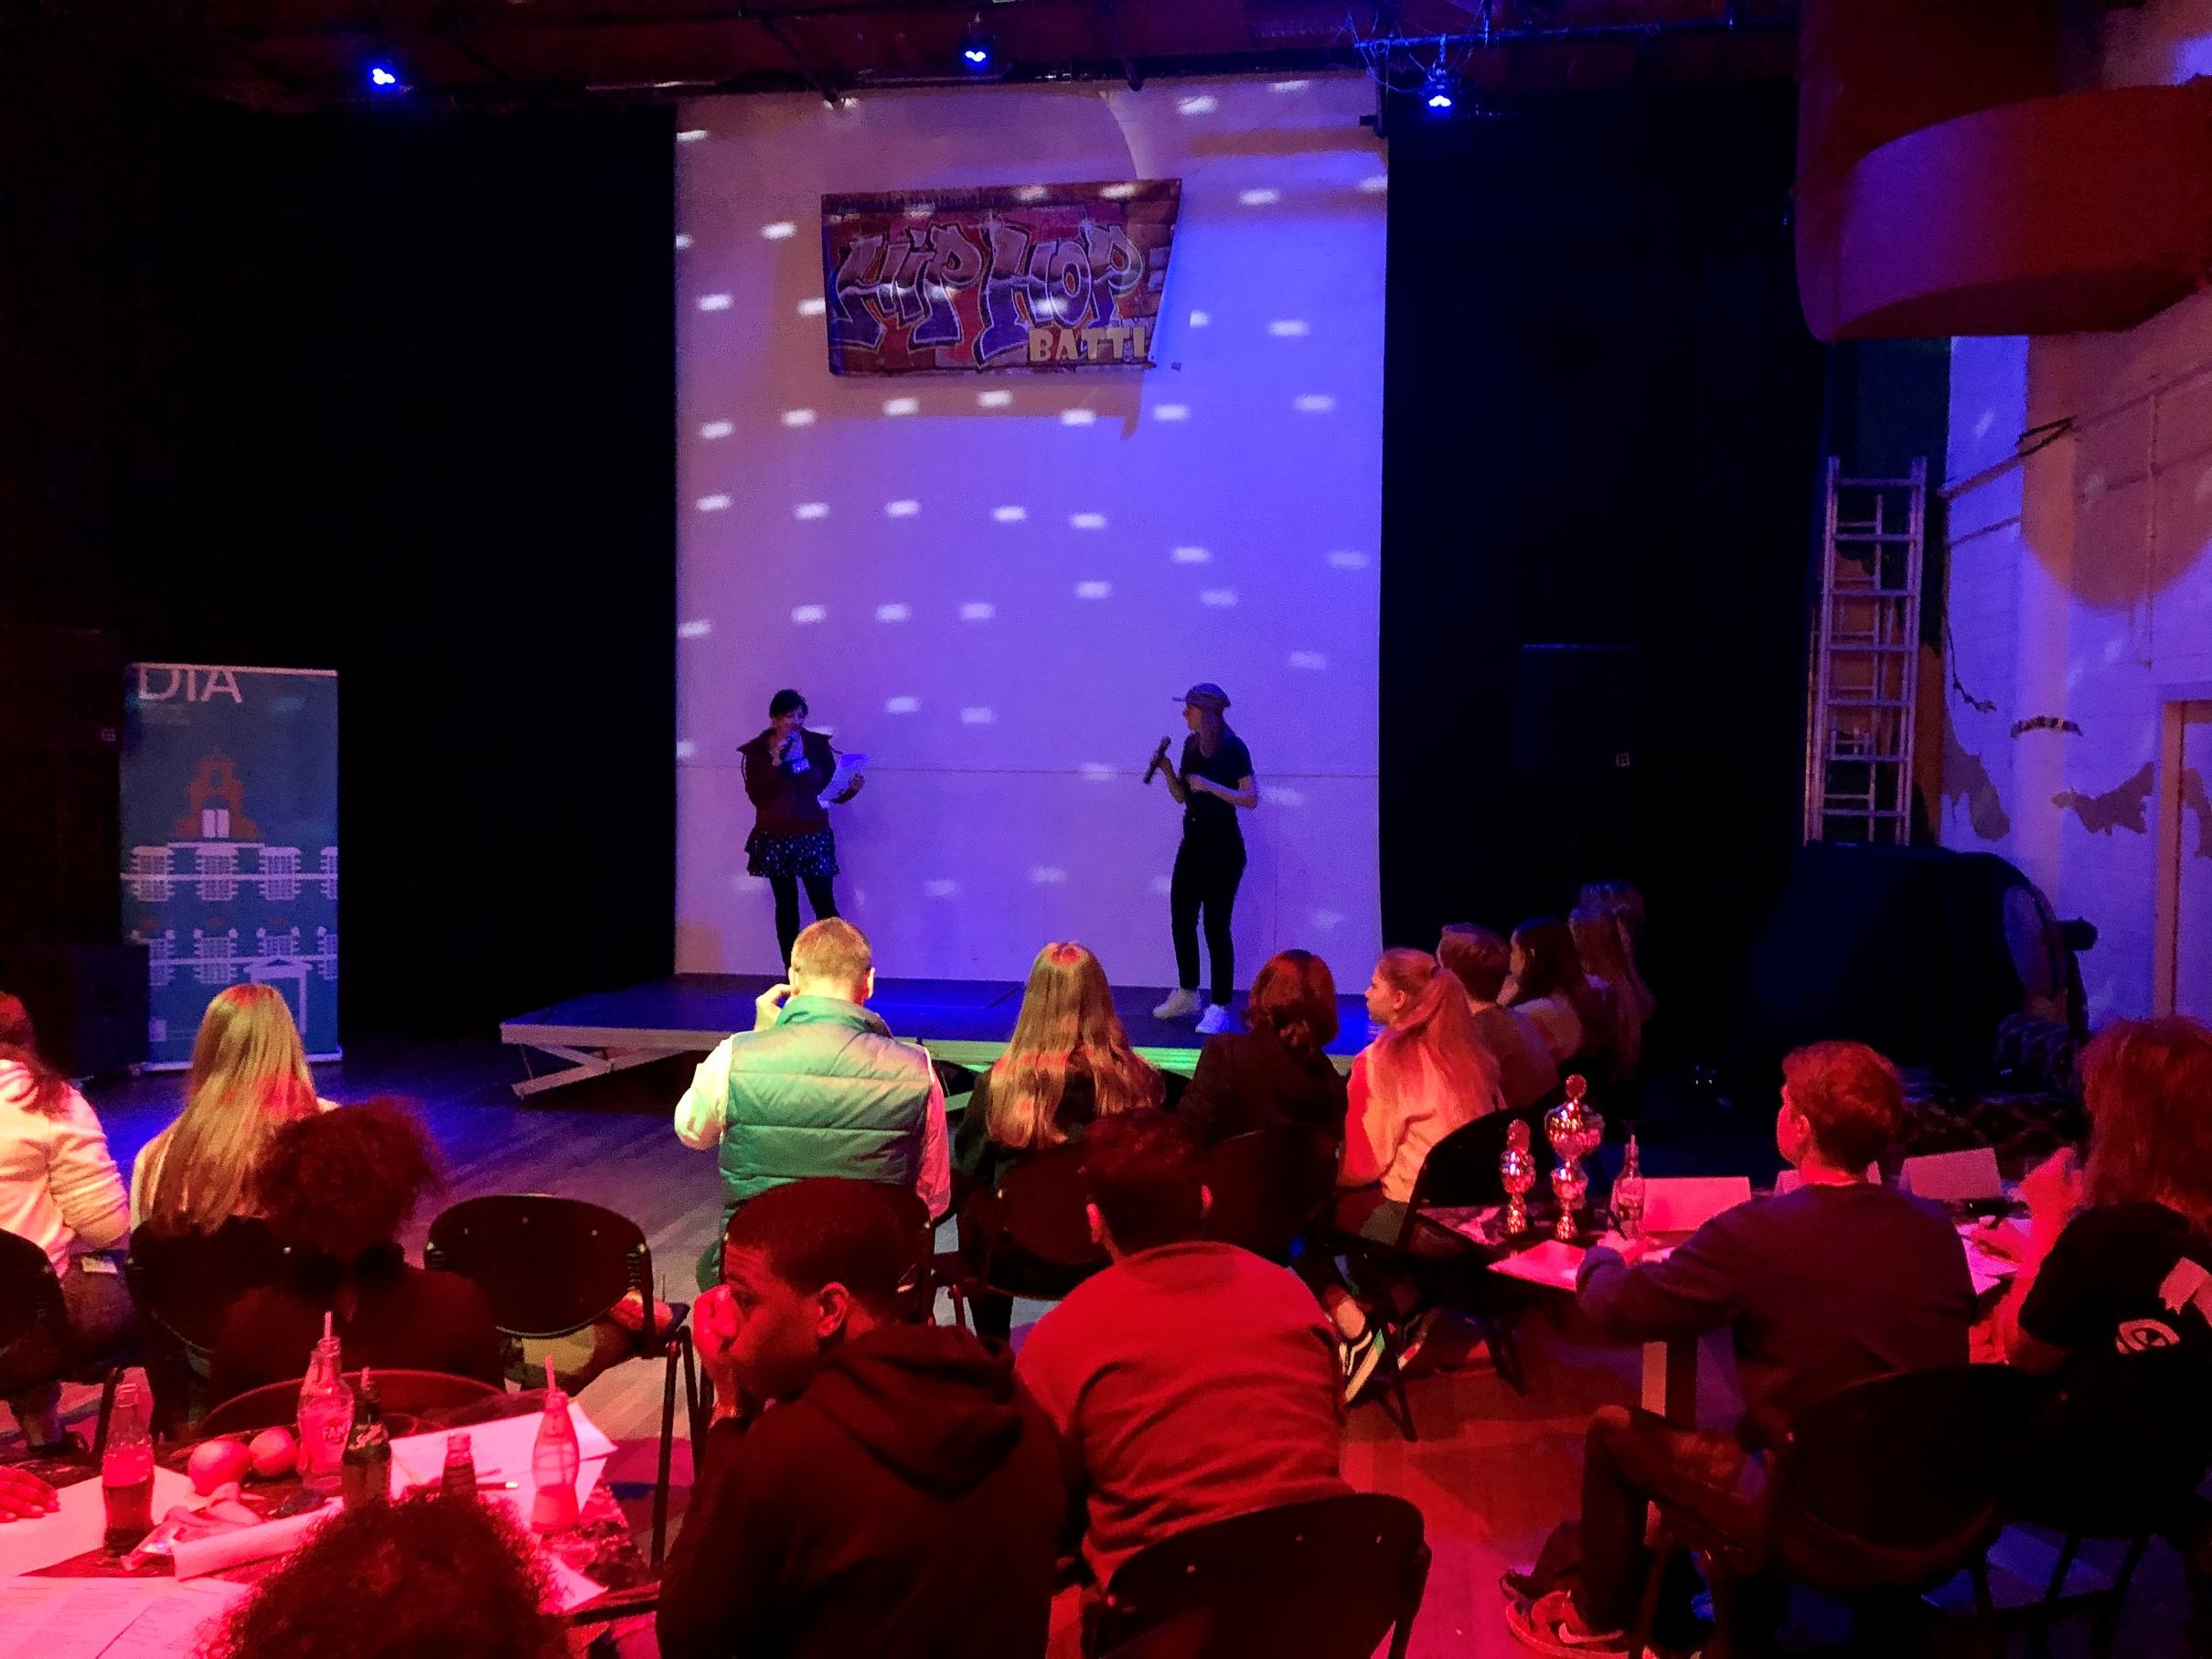 Amsterdamse scholieren winnen Duitse Hiphop-Battle